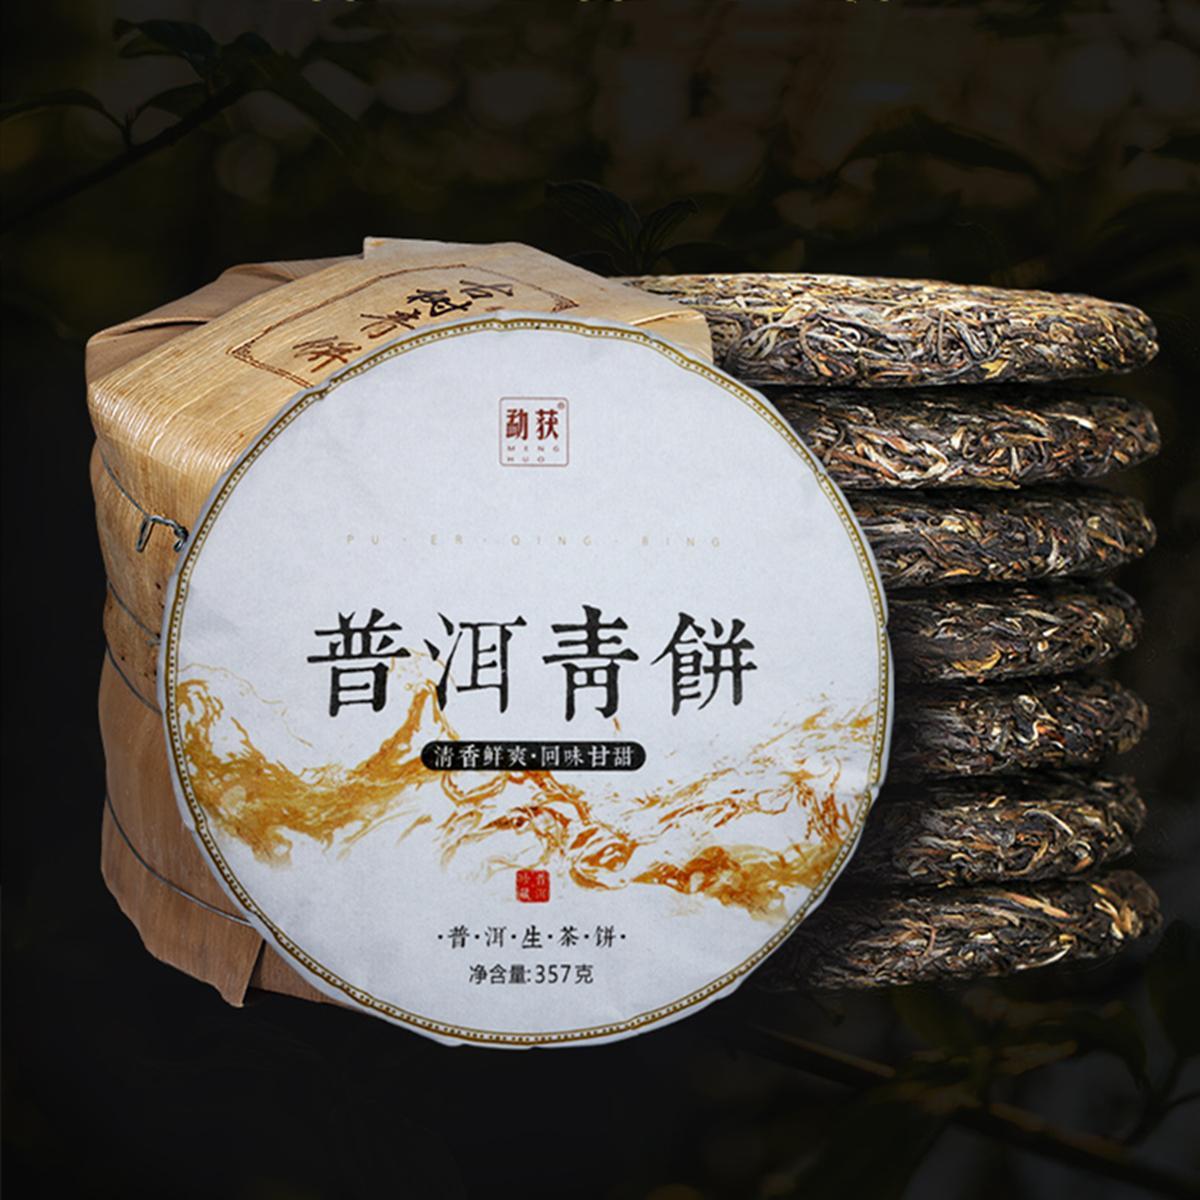 357g ham puerh çay yunnan antik ağaç yeşil puer çay organik pu'er en eski ağaç yeşil pu'er doğal puerh çay kek fabrika doğrudan satış